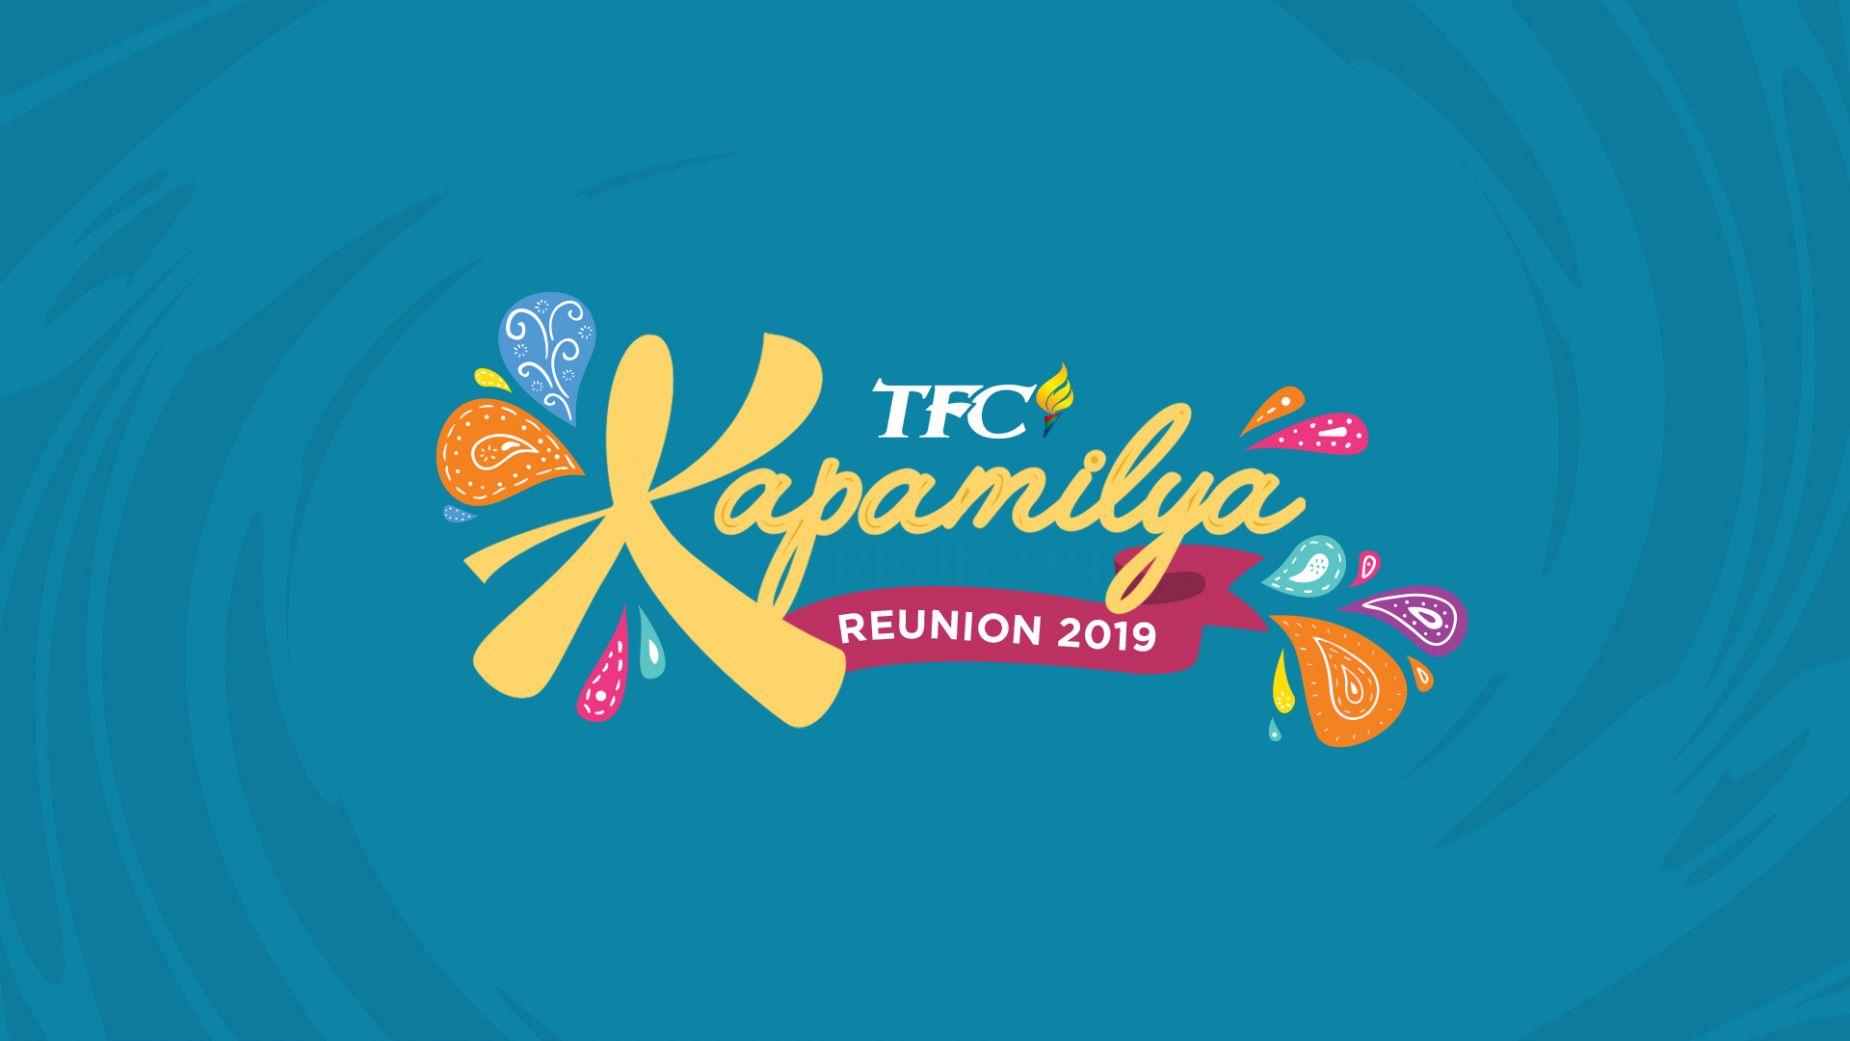 Kapamilya-Reunion-2019